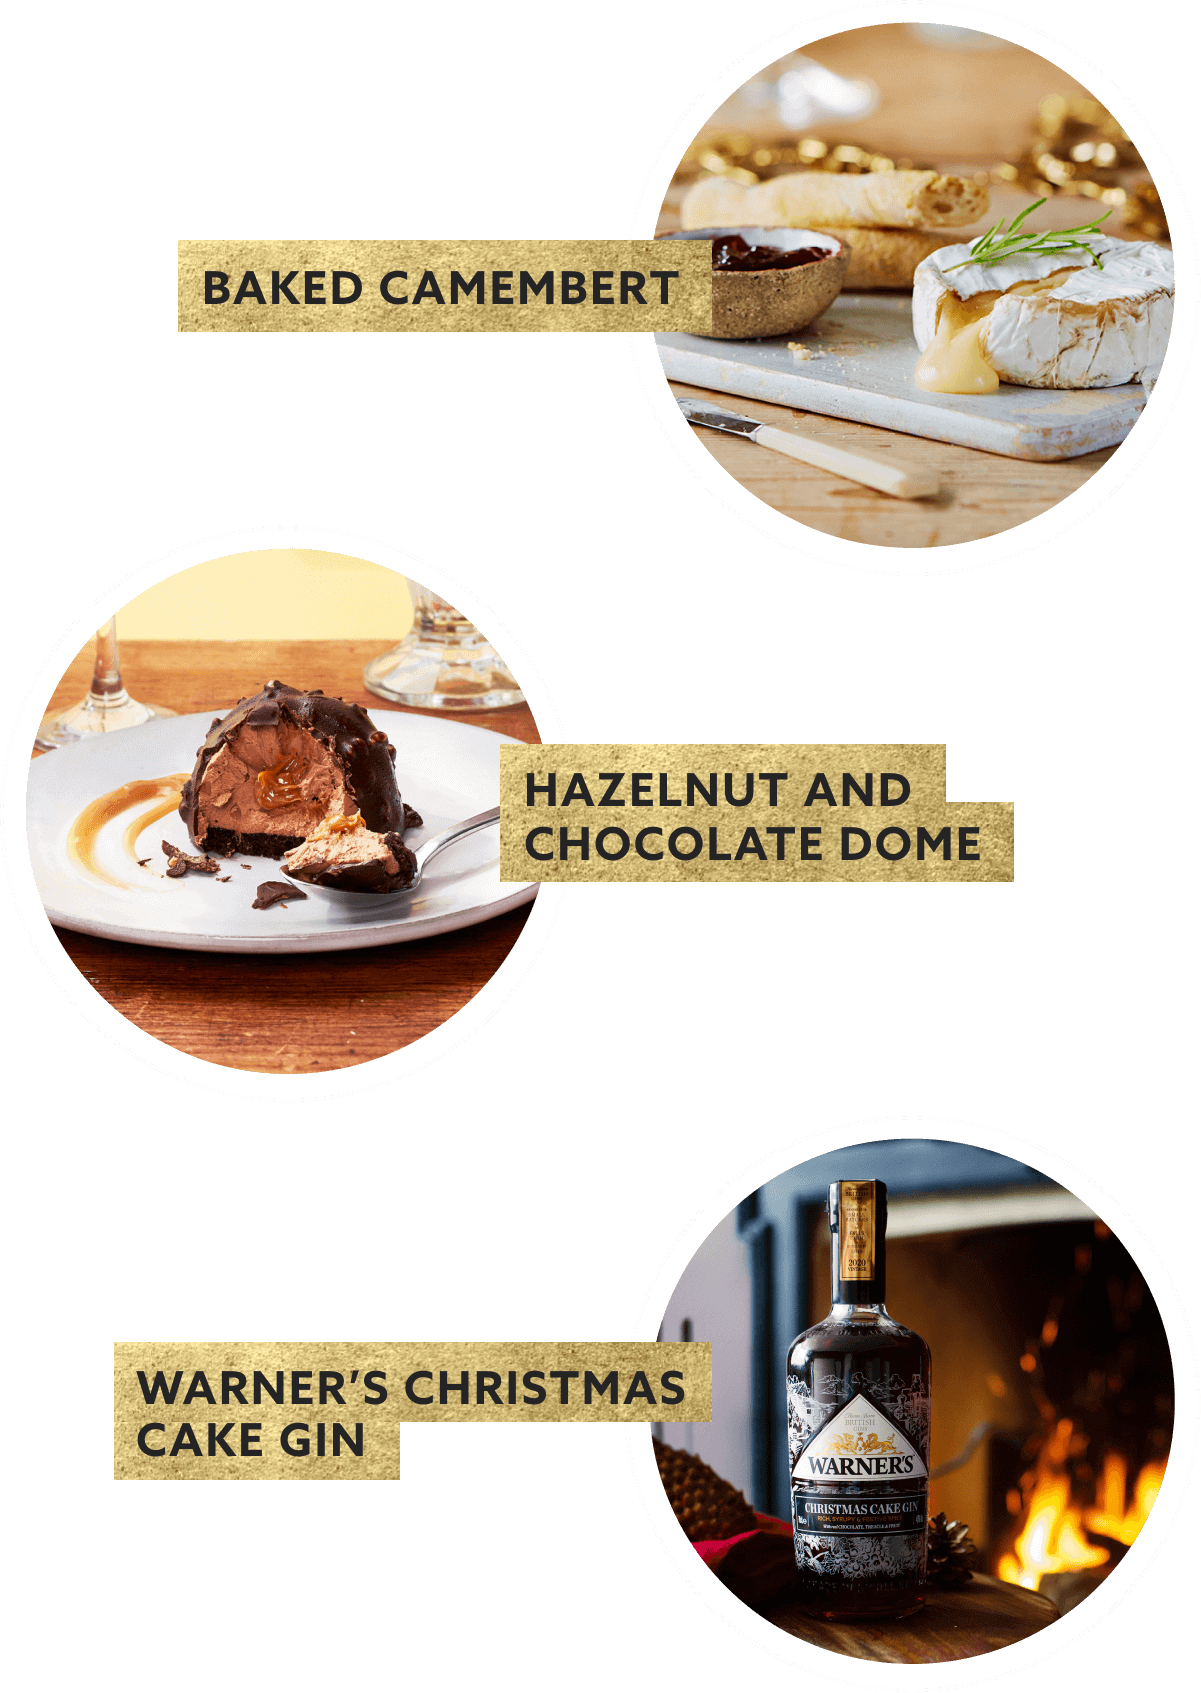 BAKED CAMEMEMBERT, HAZELNUT AND CHOCOLATE DOME, WARNER''S CHRISTMAS CAKE GIN